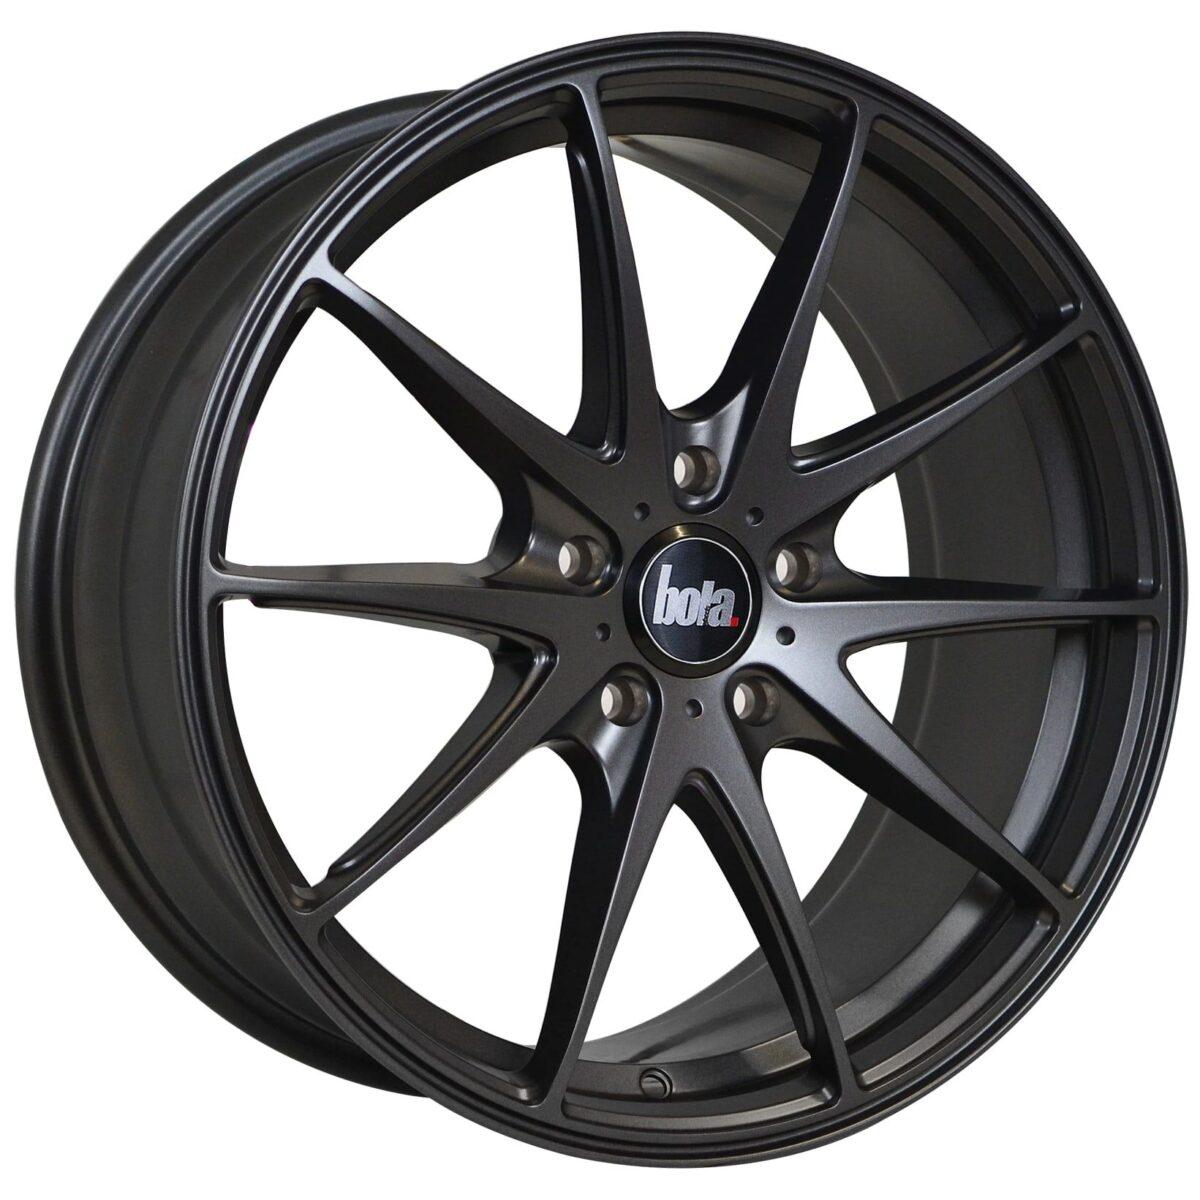 "18"" BOLA B9 Wheels - Matt Gunmetal - VW / Audi / Mercedes - 5x112"